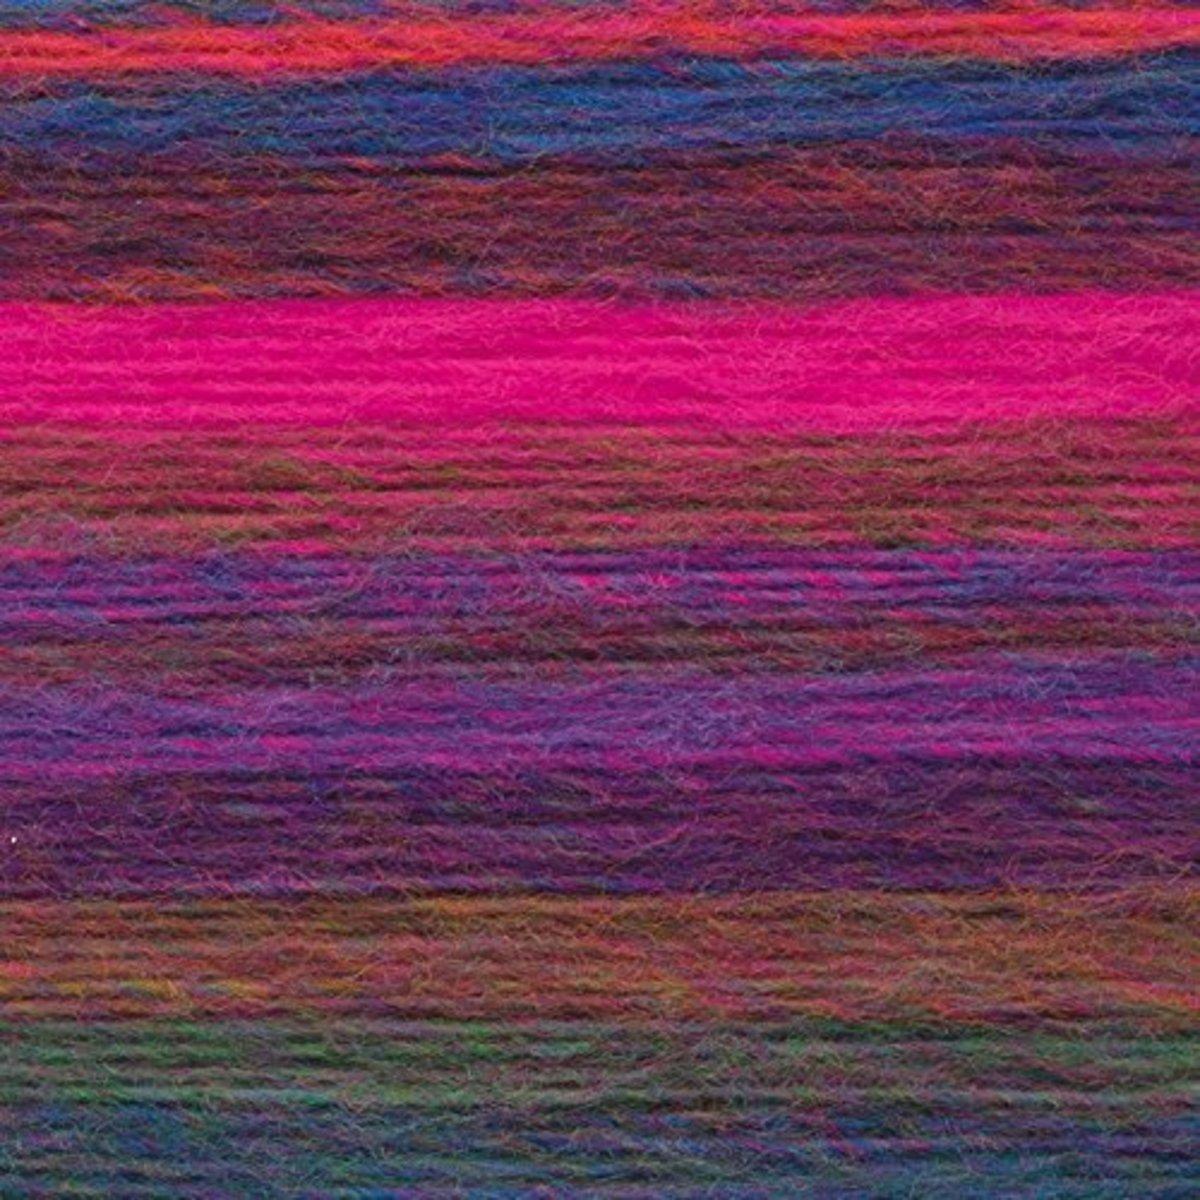 Variegated color change yarn pinks purples